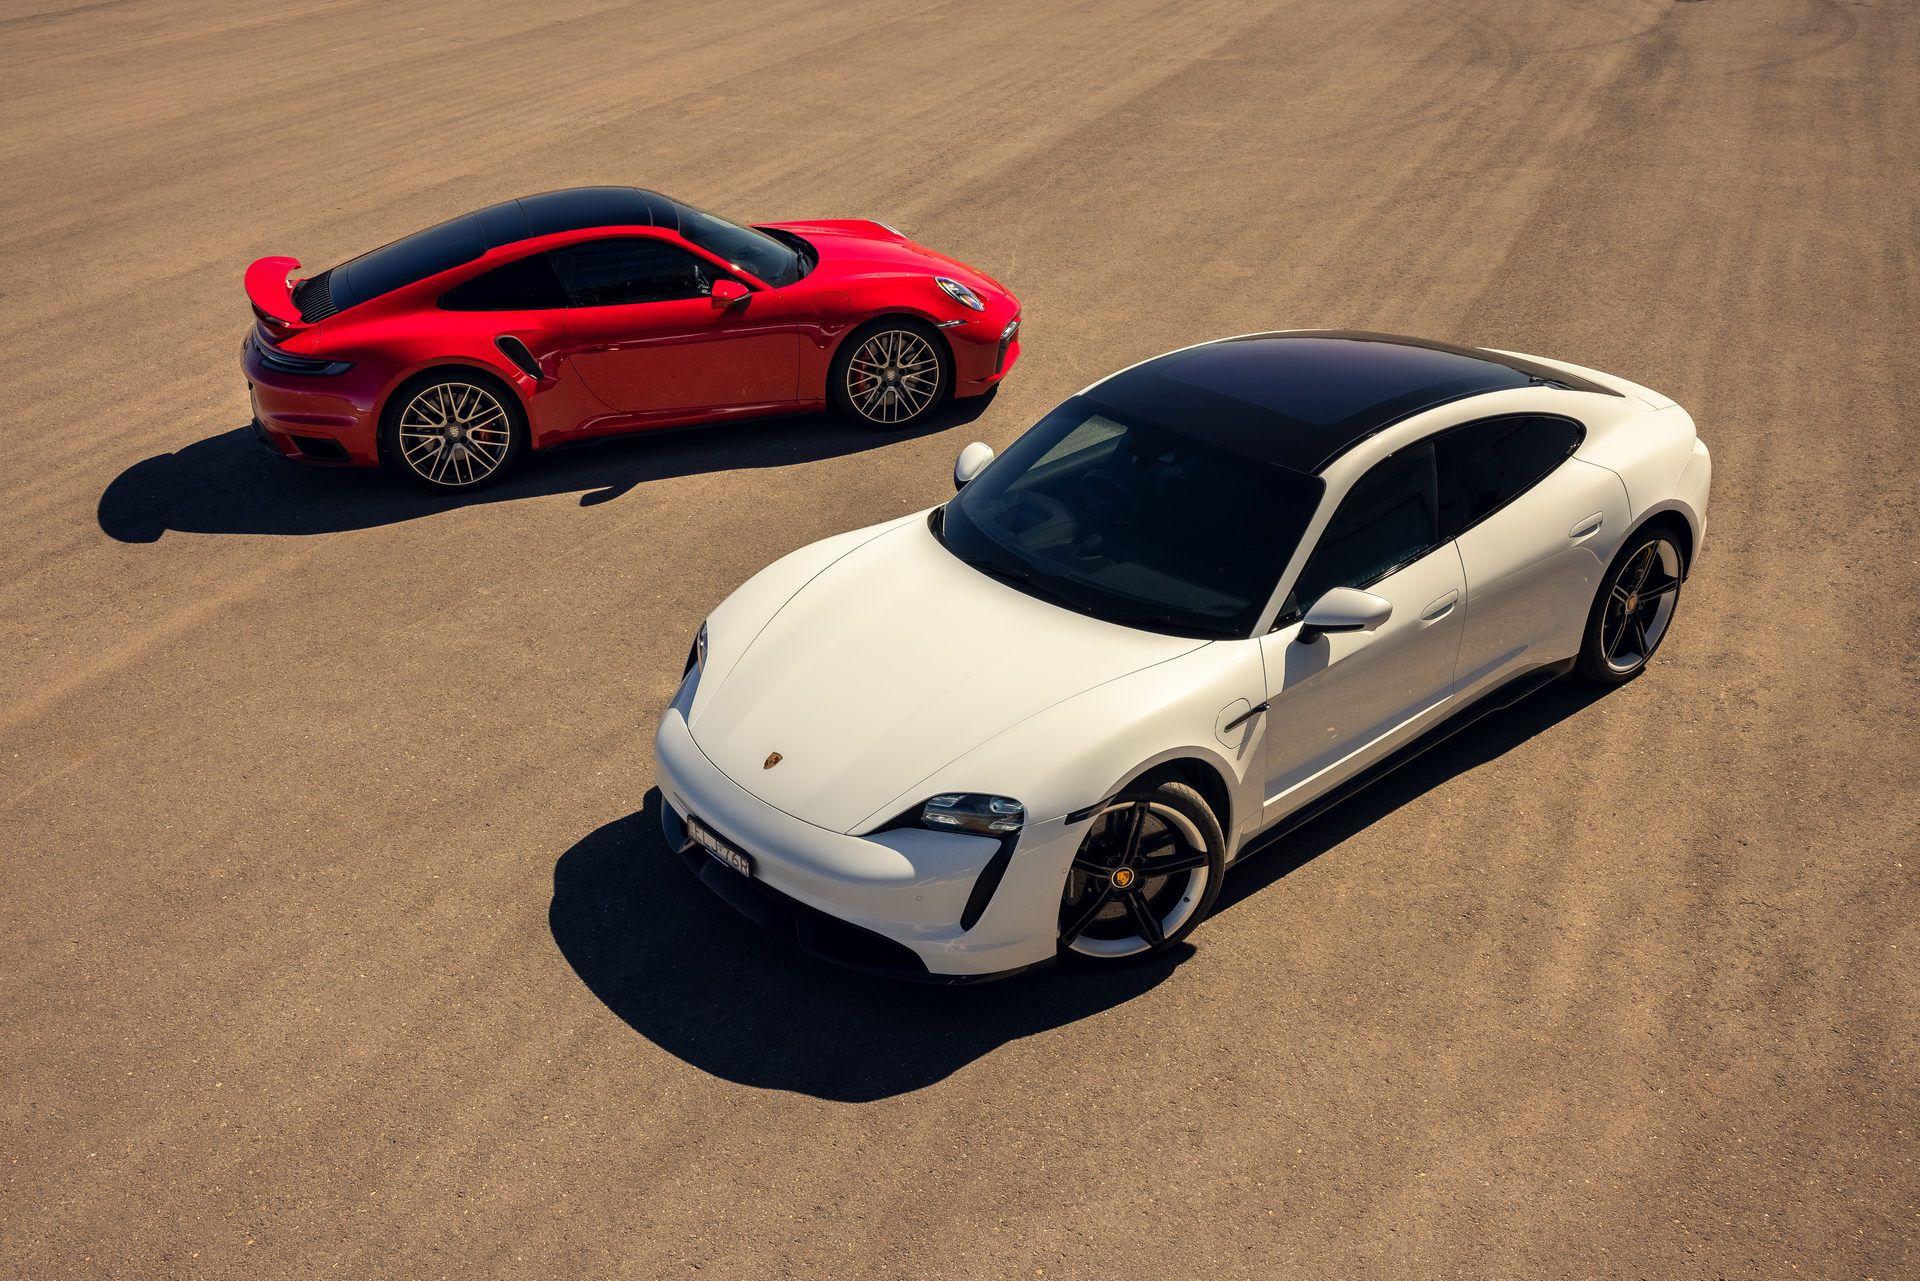 Porsche-Taycan-Turbo-S-The-Bend-Motorsport-Park-51